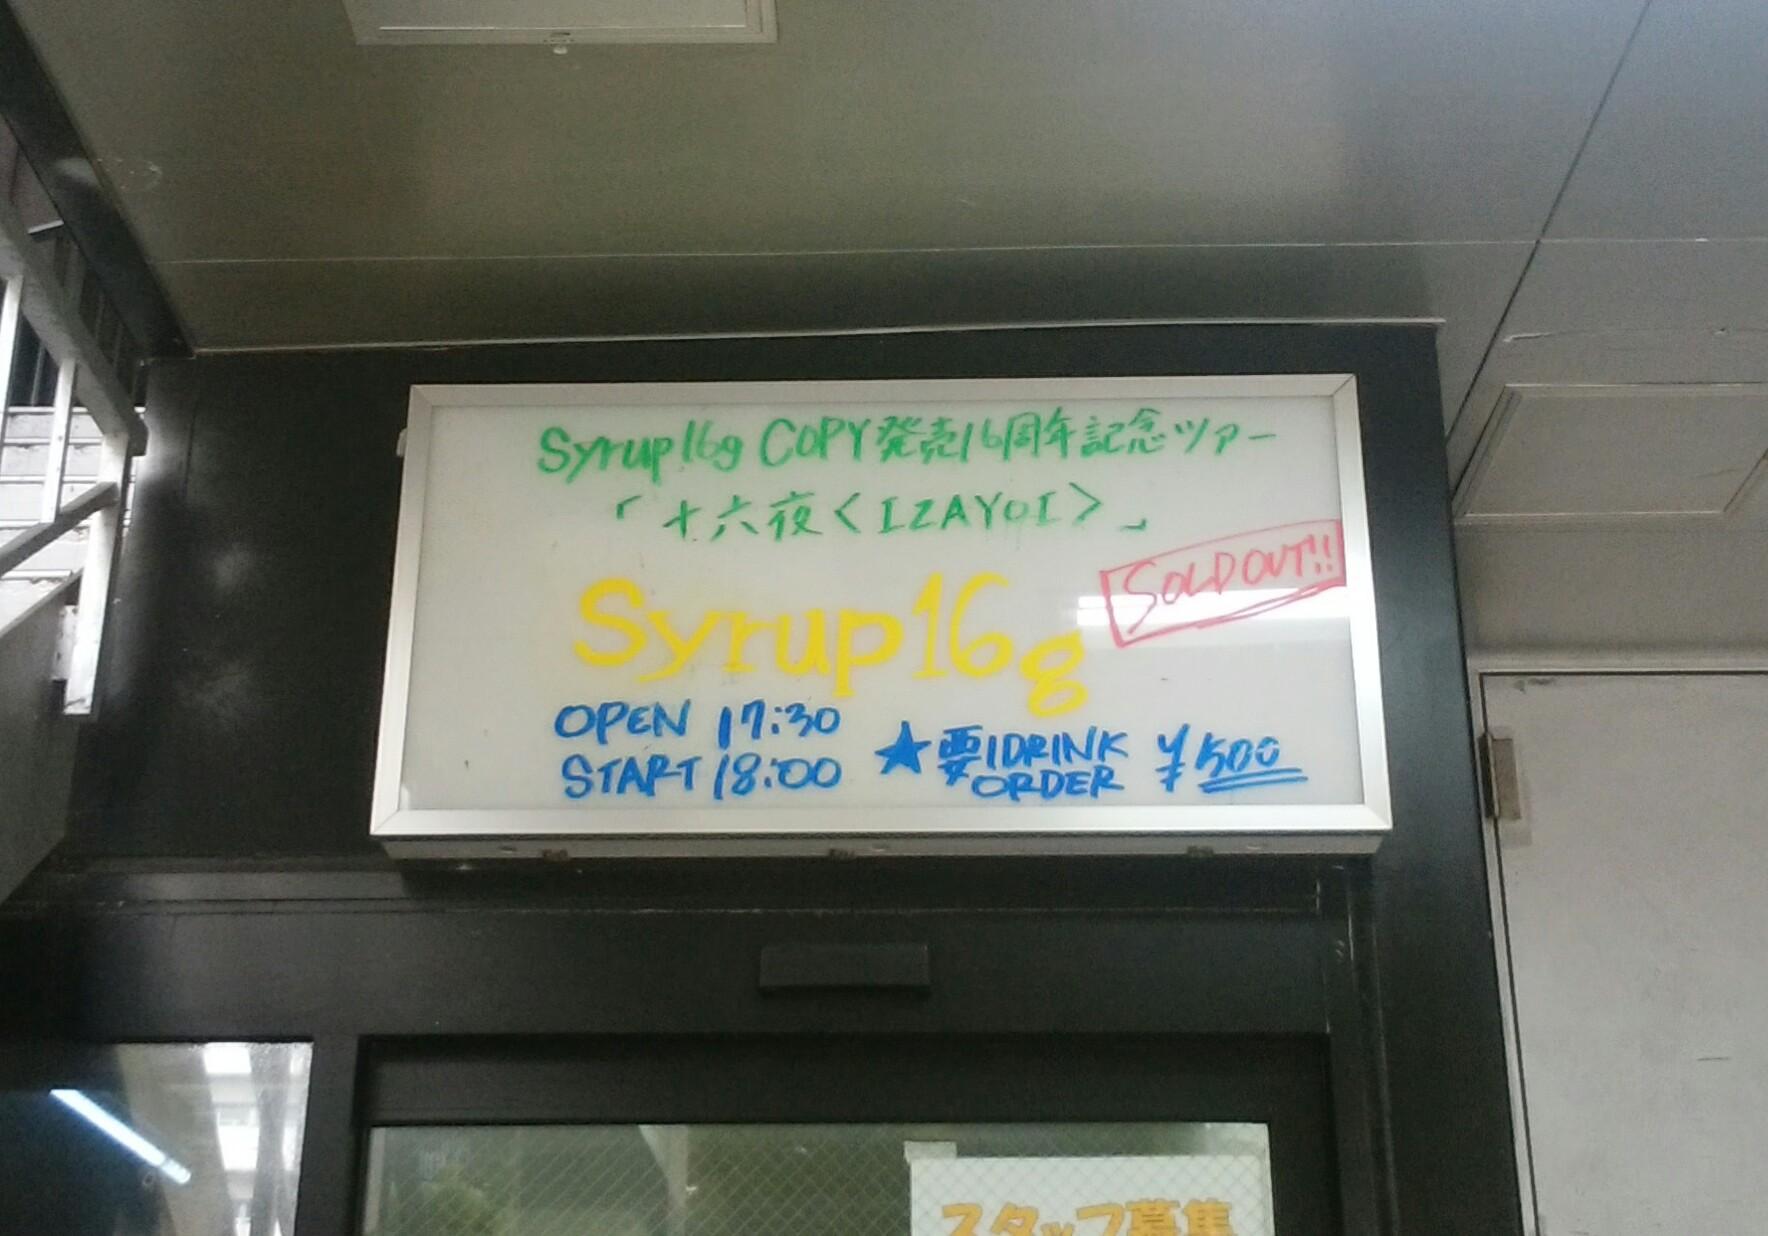 syrup16g COPY発売16周年記念ツアー『十六夜 <IZAYOI>』@福岡DRUM Be-1 2017.10.8